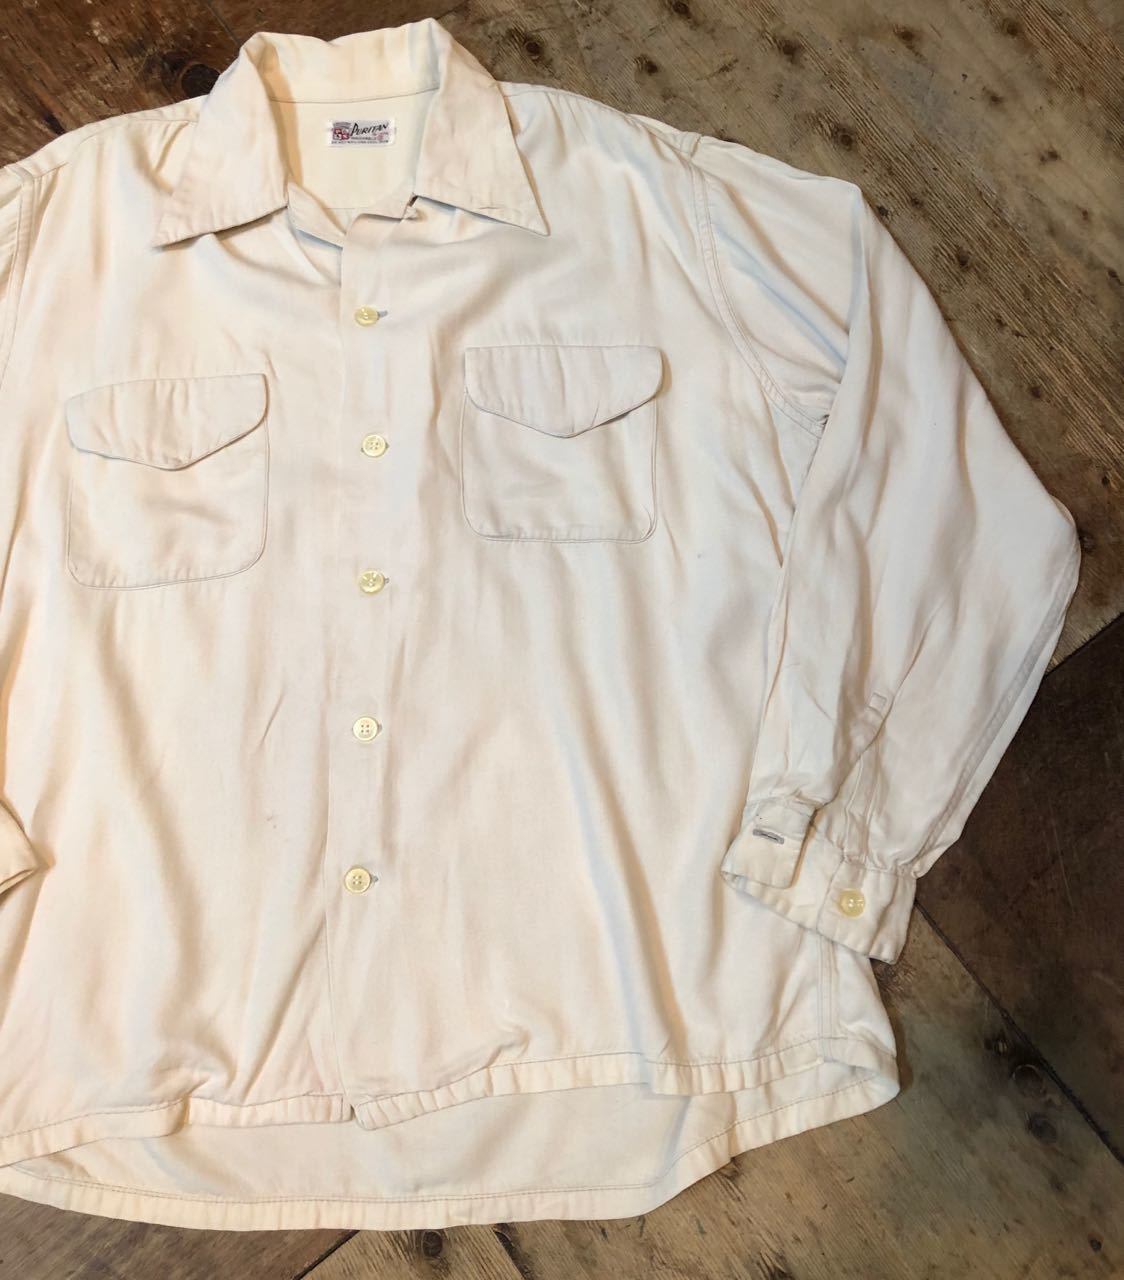 4月13日(土)入荷! 50s PURITAN Gabardine shirts  !_c0144020_13564040.jpg